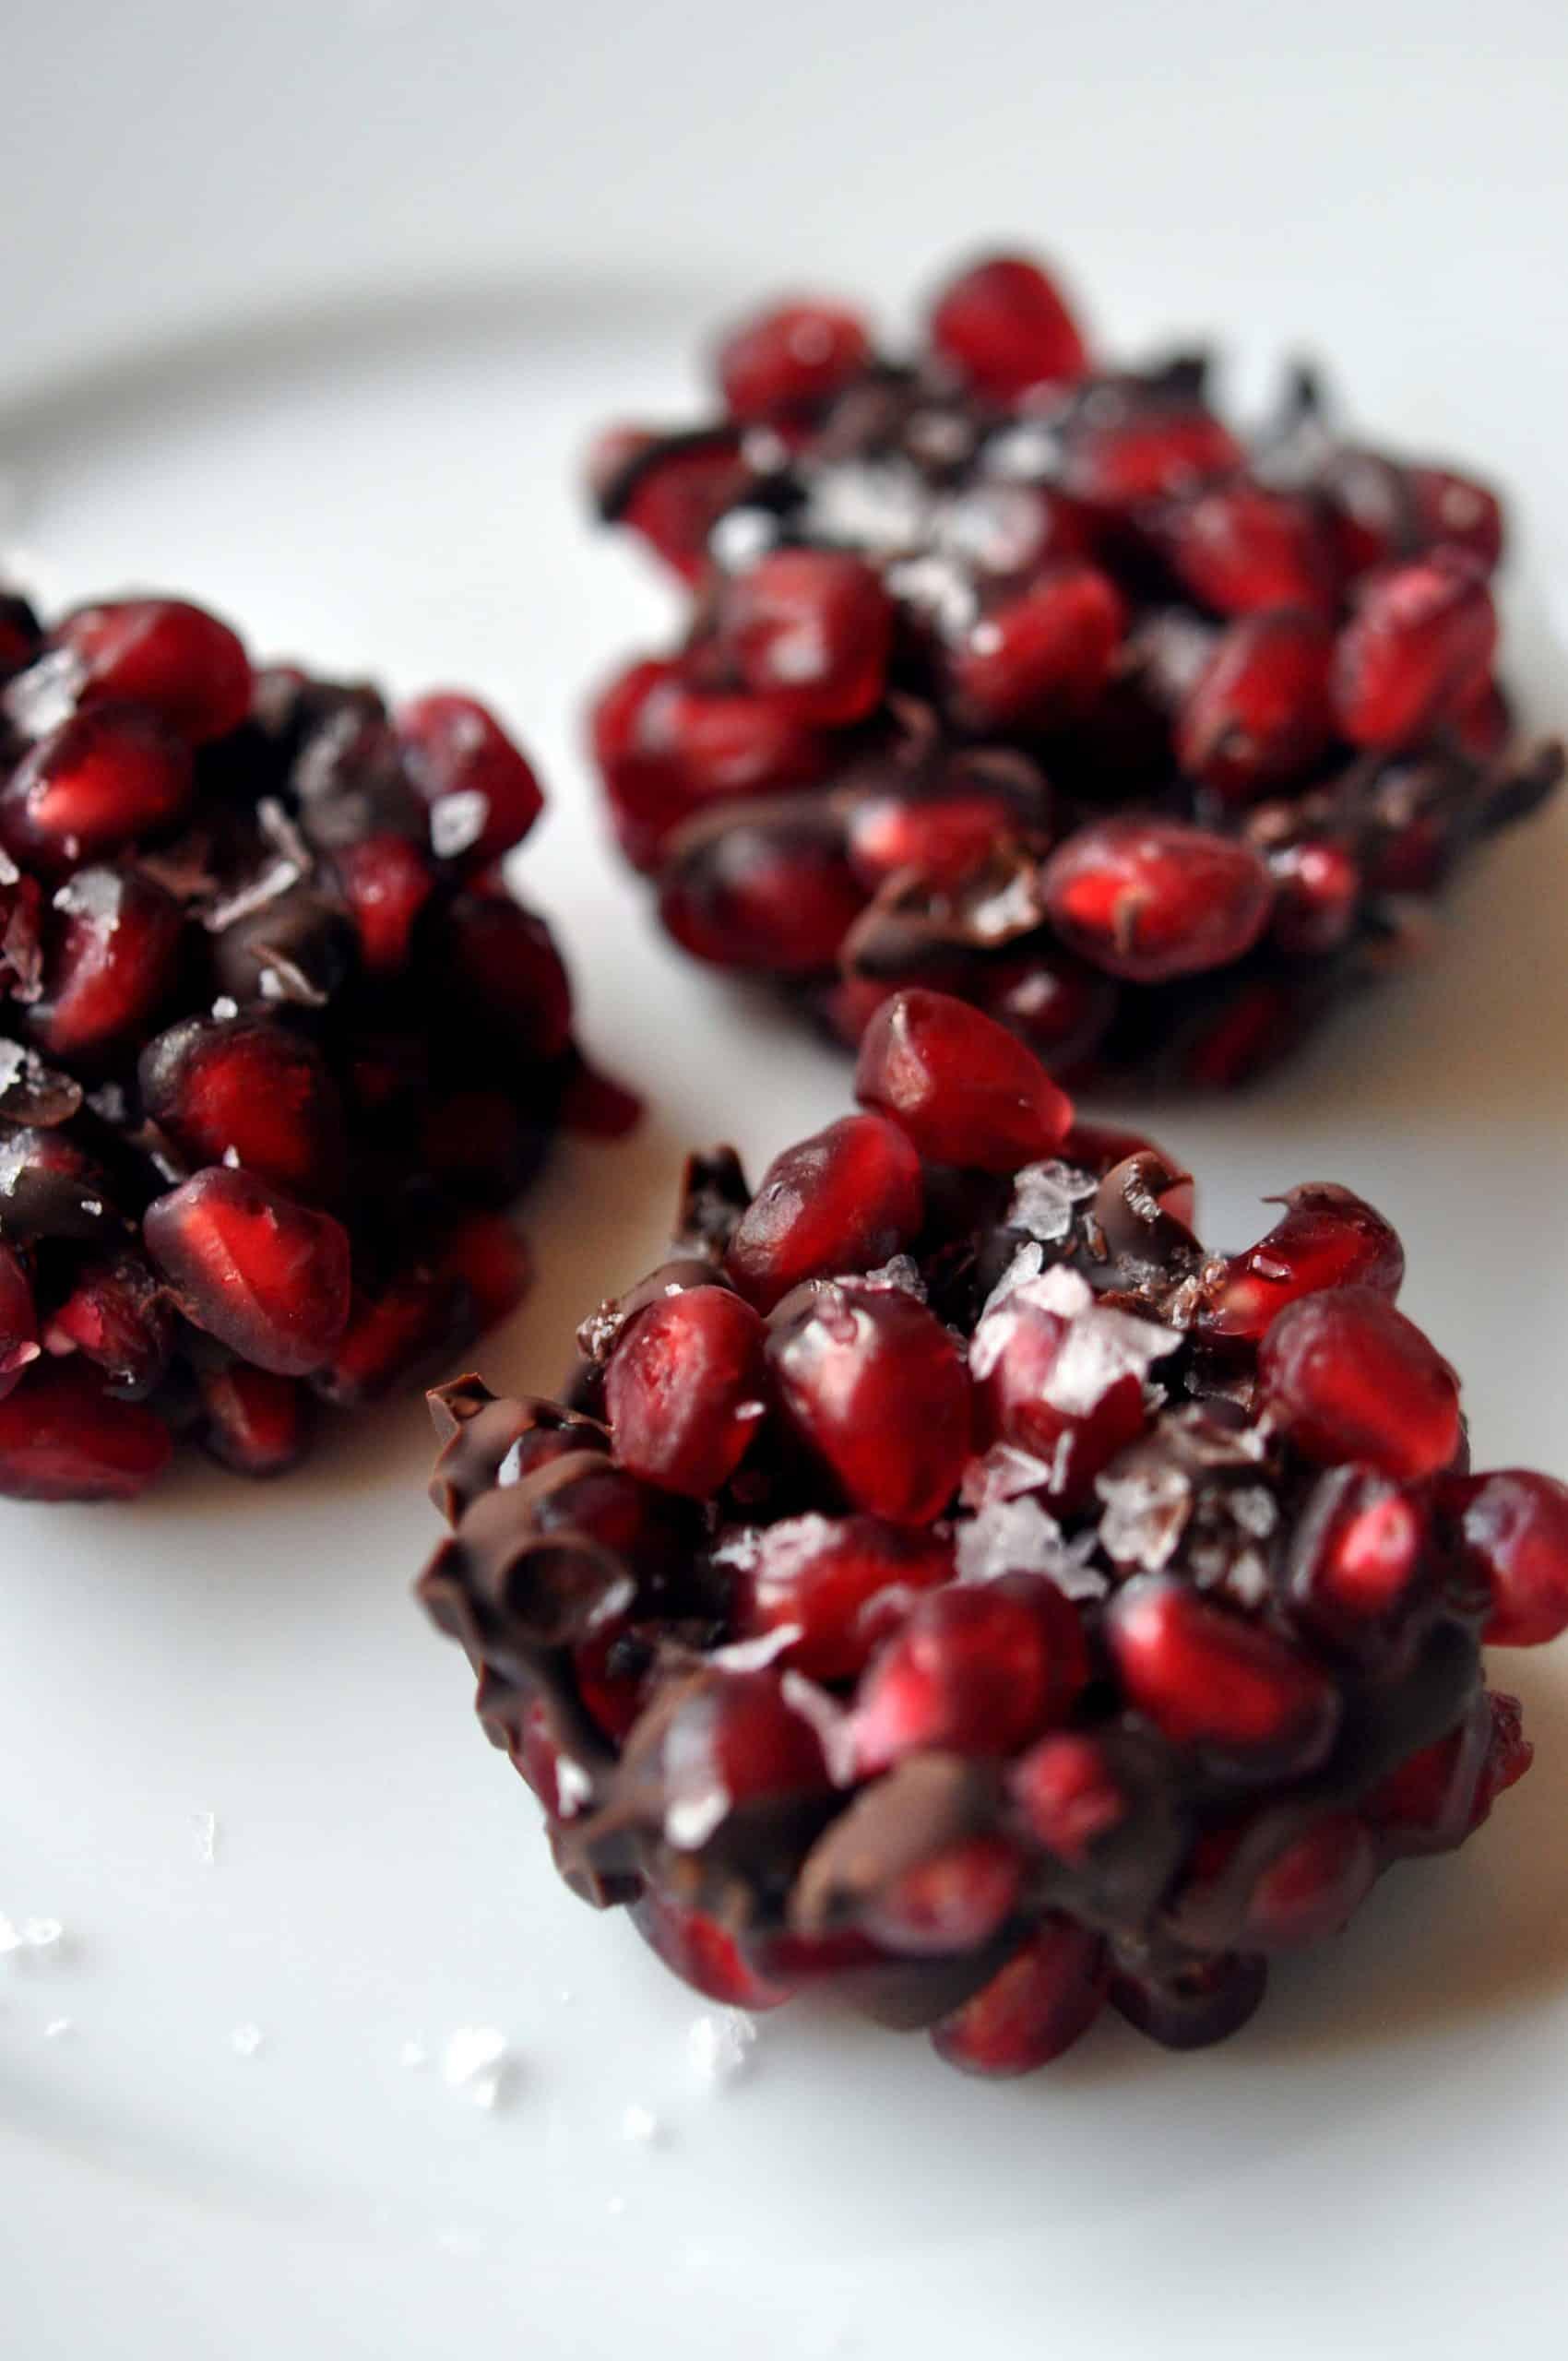 three pomegranate dark chocolate bites on a white background